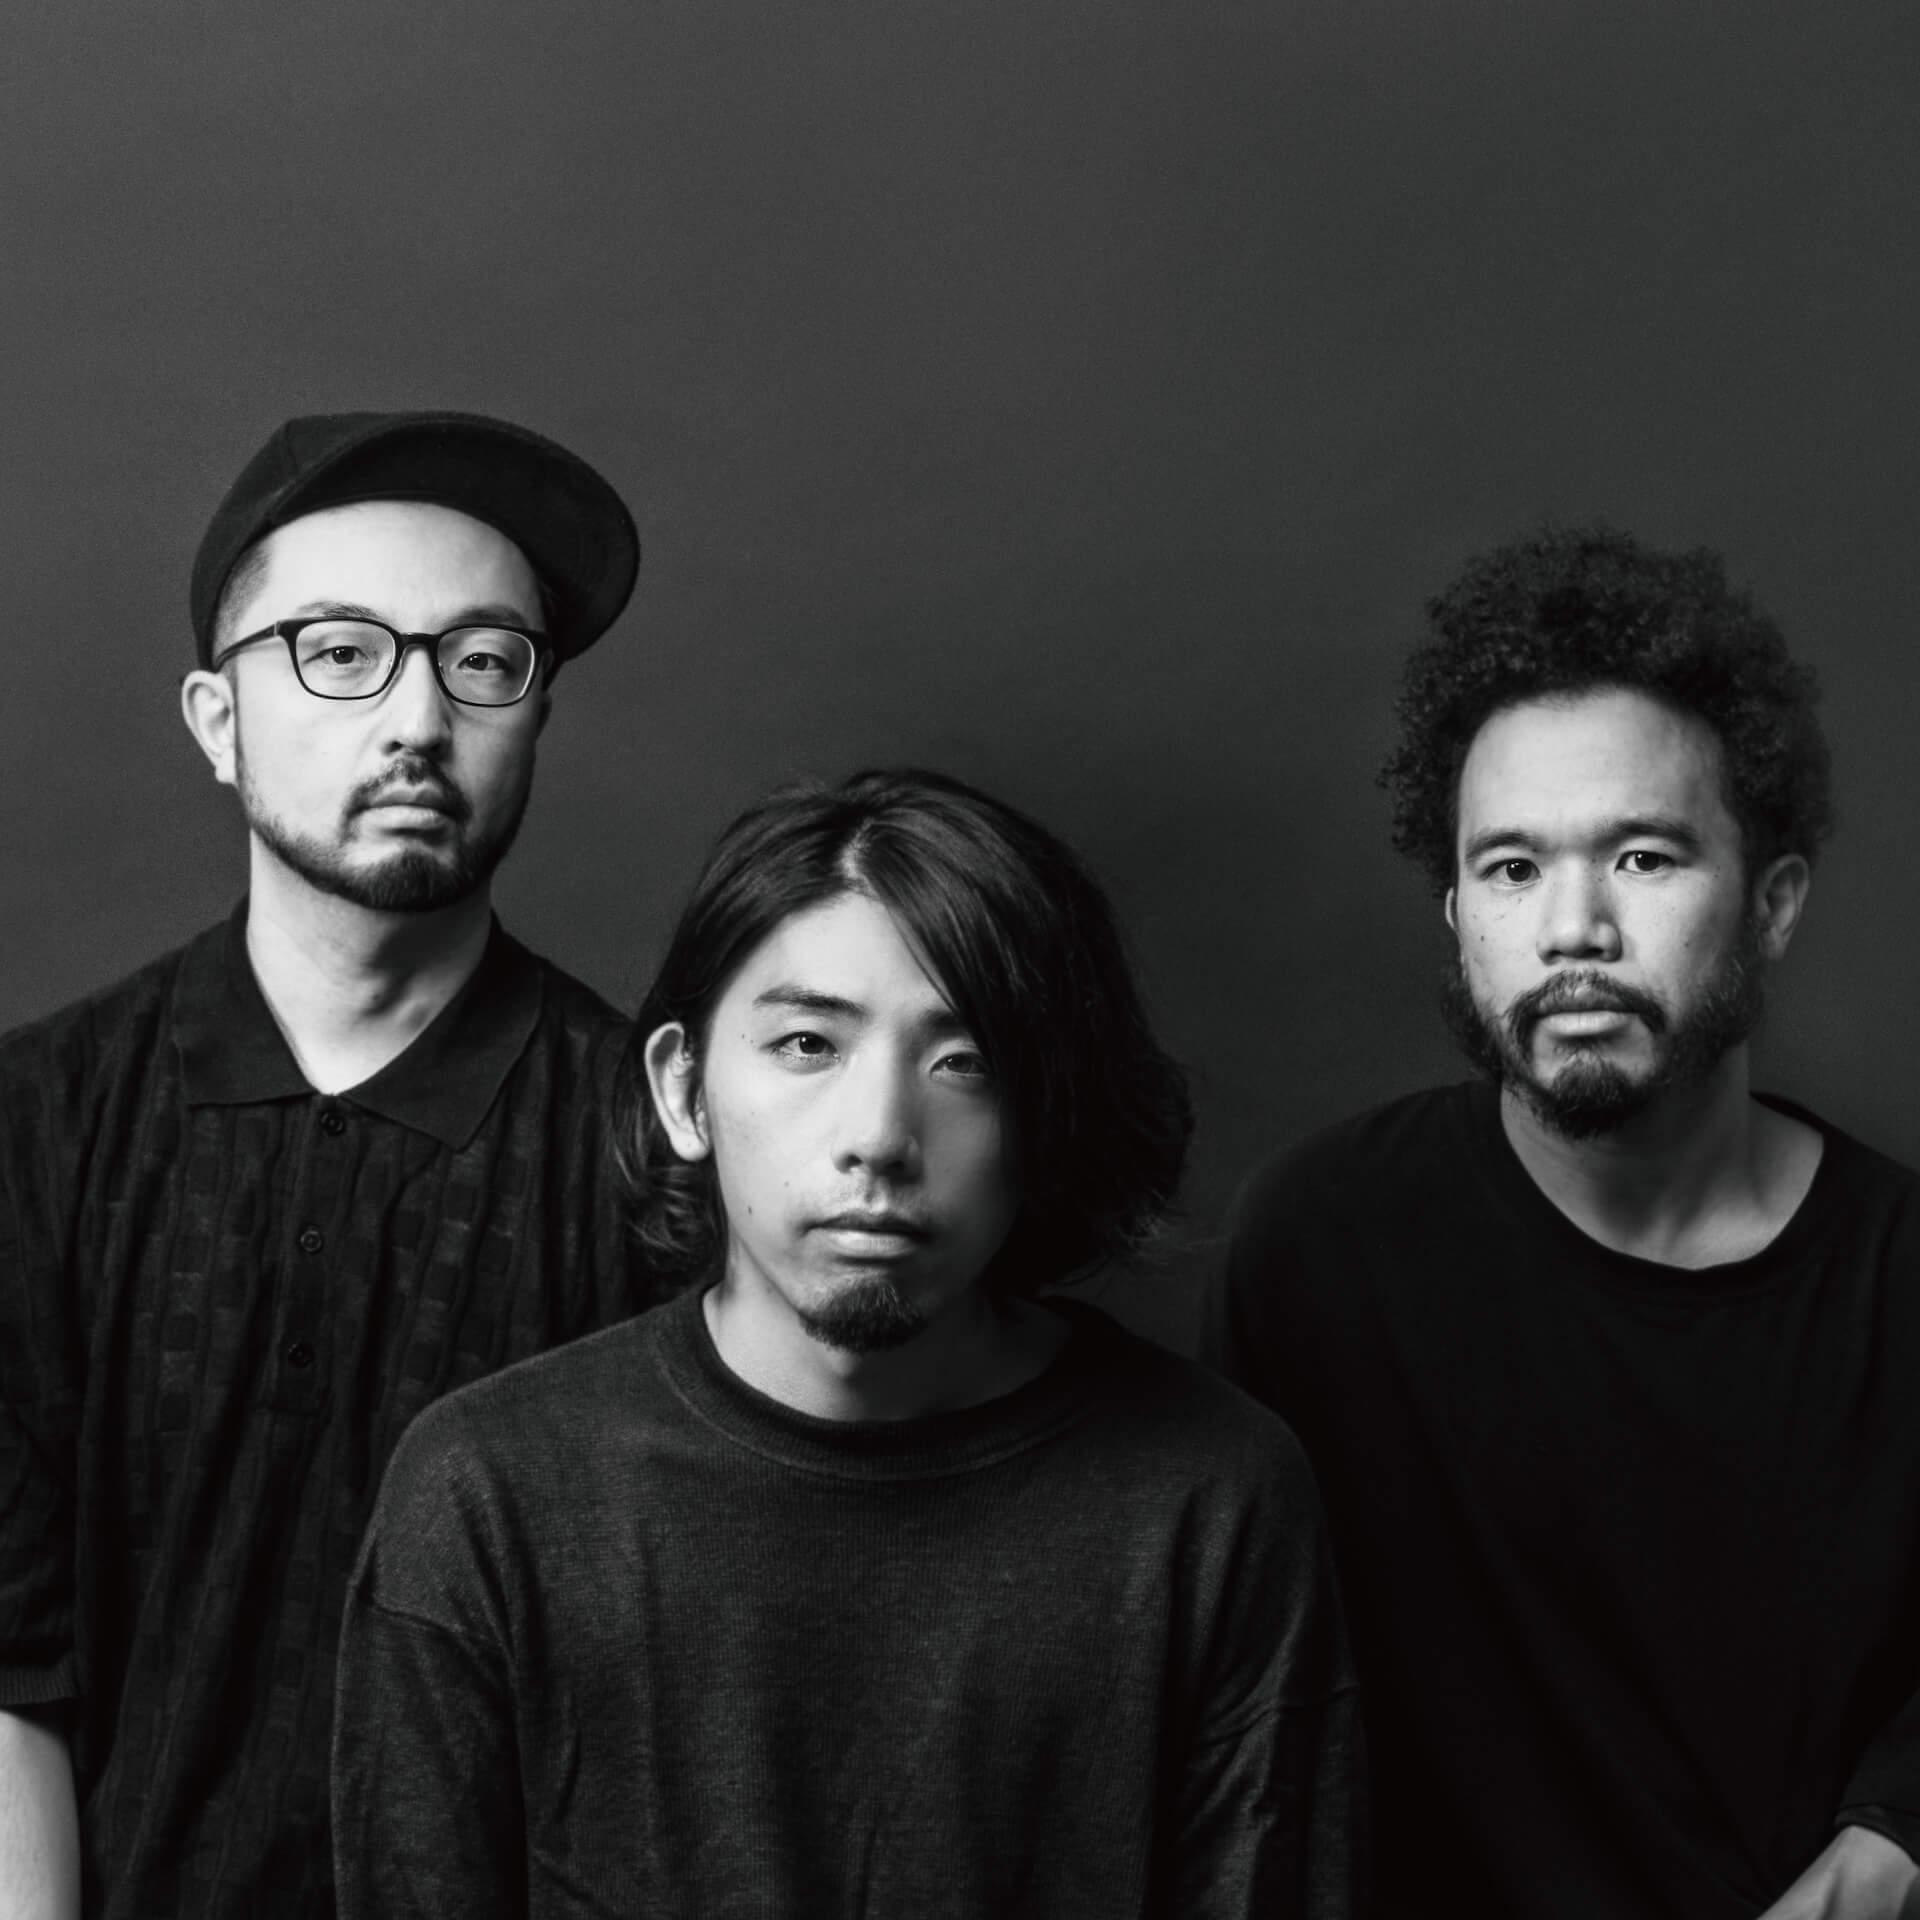 Kan Sano、Michael Kaneko、mabanuaらが出演する<origami SAI 2020 Tokyo>の配信チケットが発売決定!会場チケットの追加販売&Hiro-a-keyのゲスト出演も music210122_origamisai_6